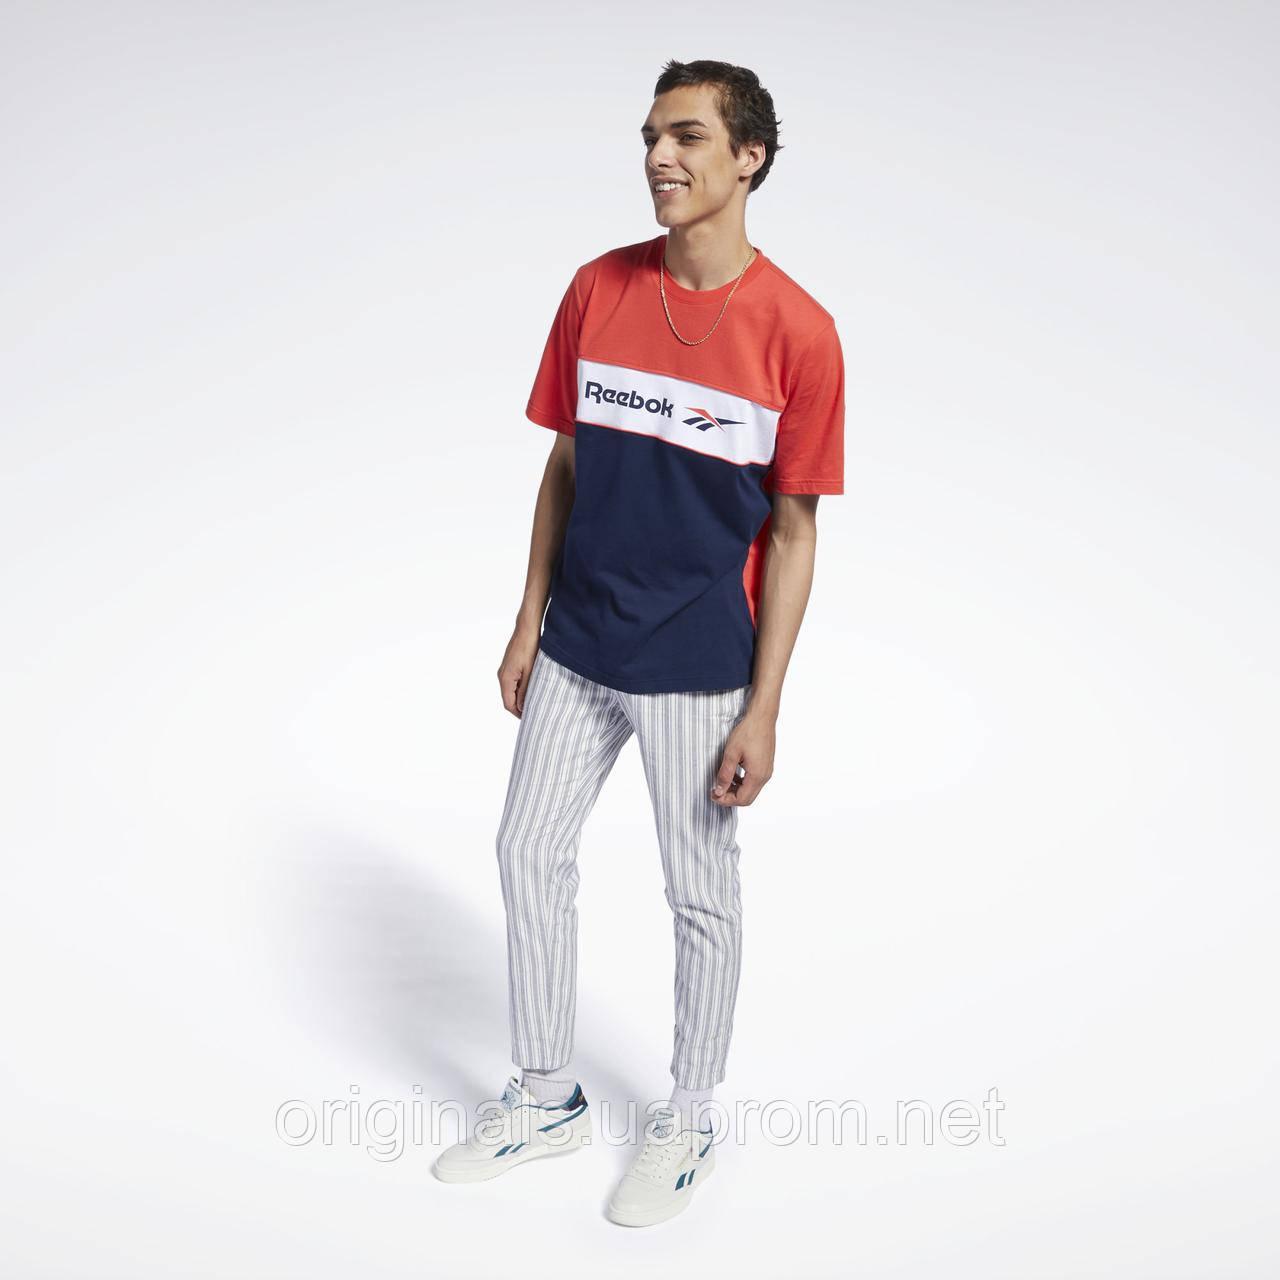 Хлопковая футболка Reebok Classics Linear FJ3346 для парней и мужчин М трехцветная